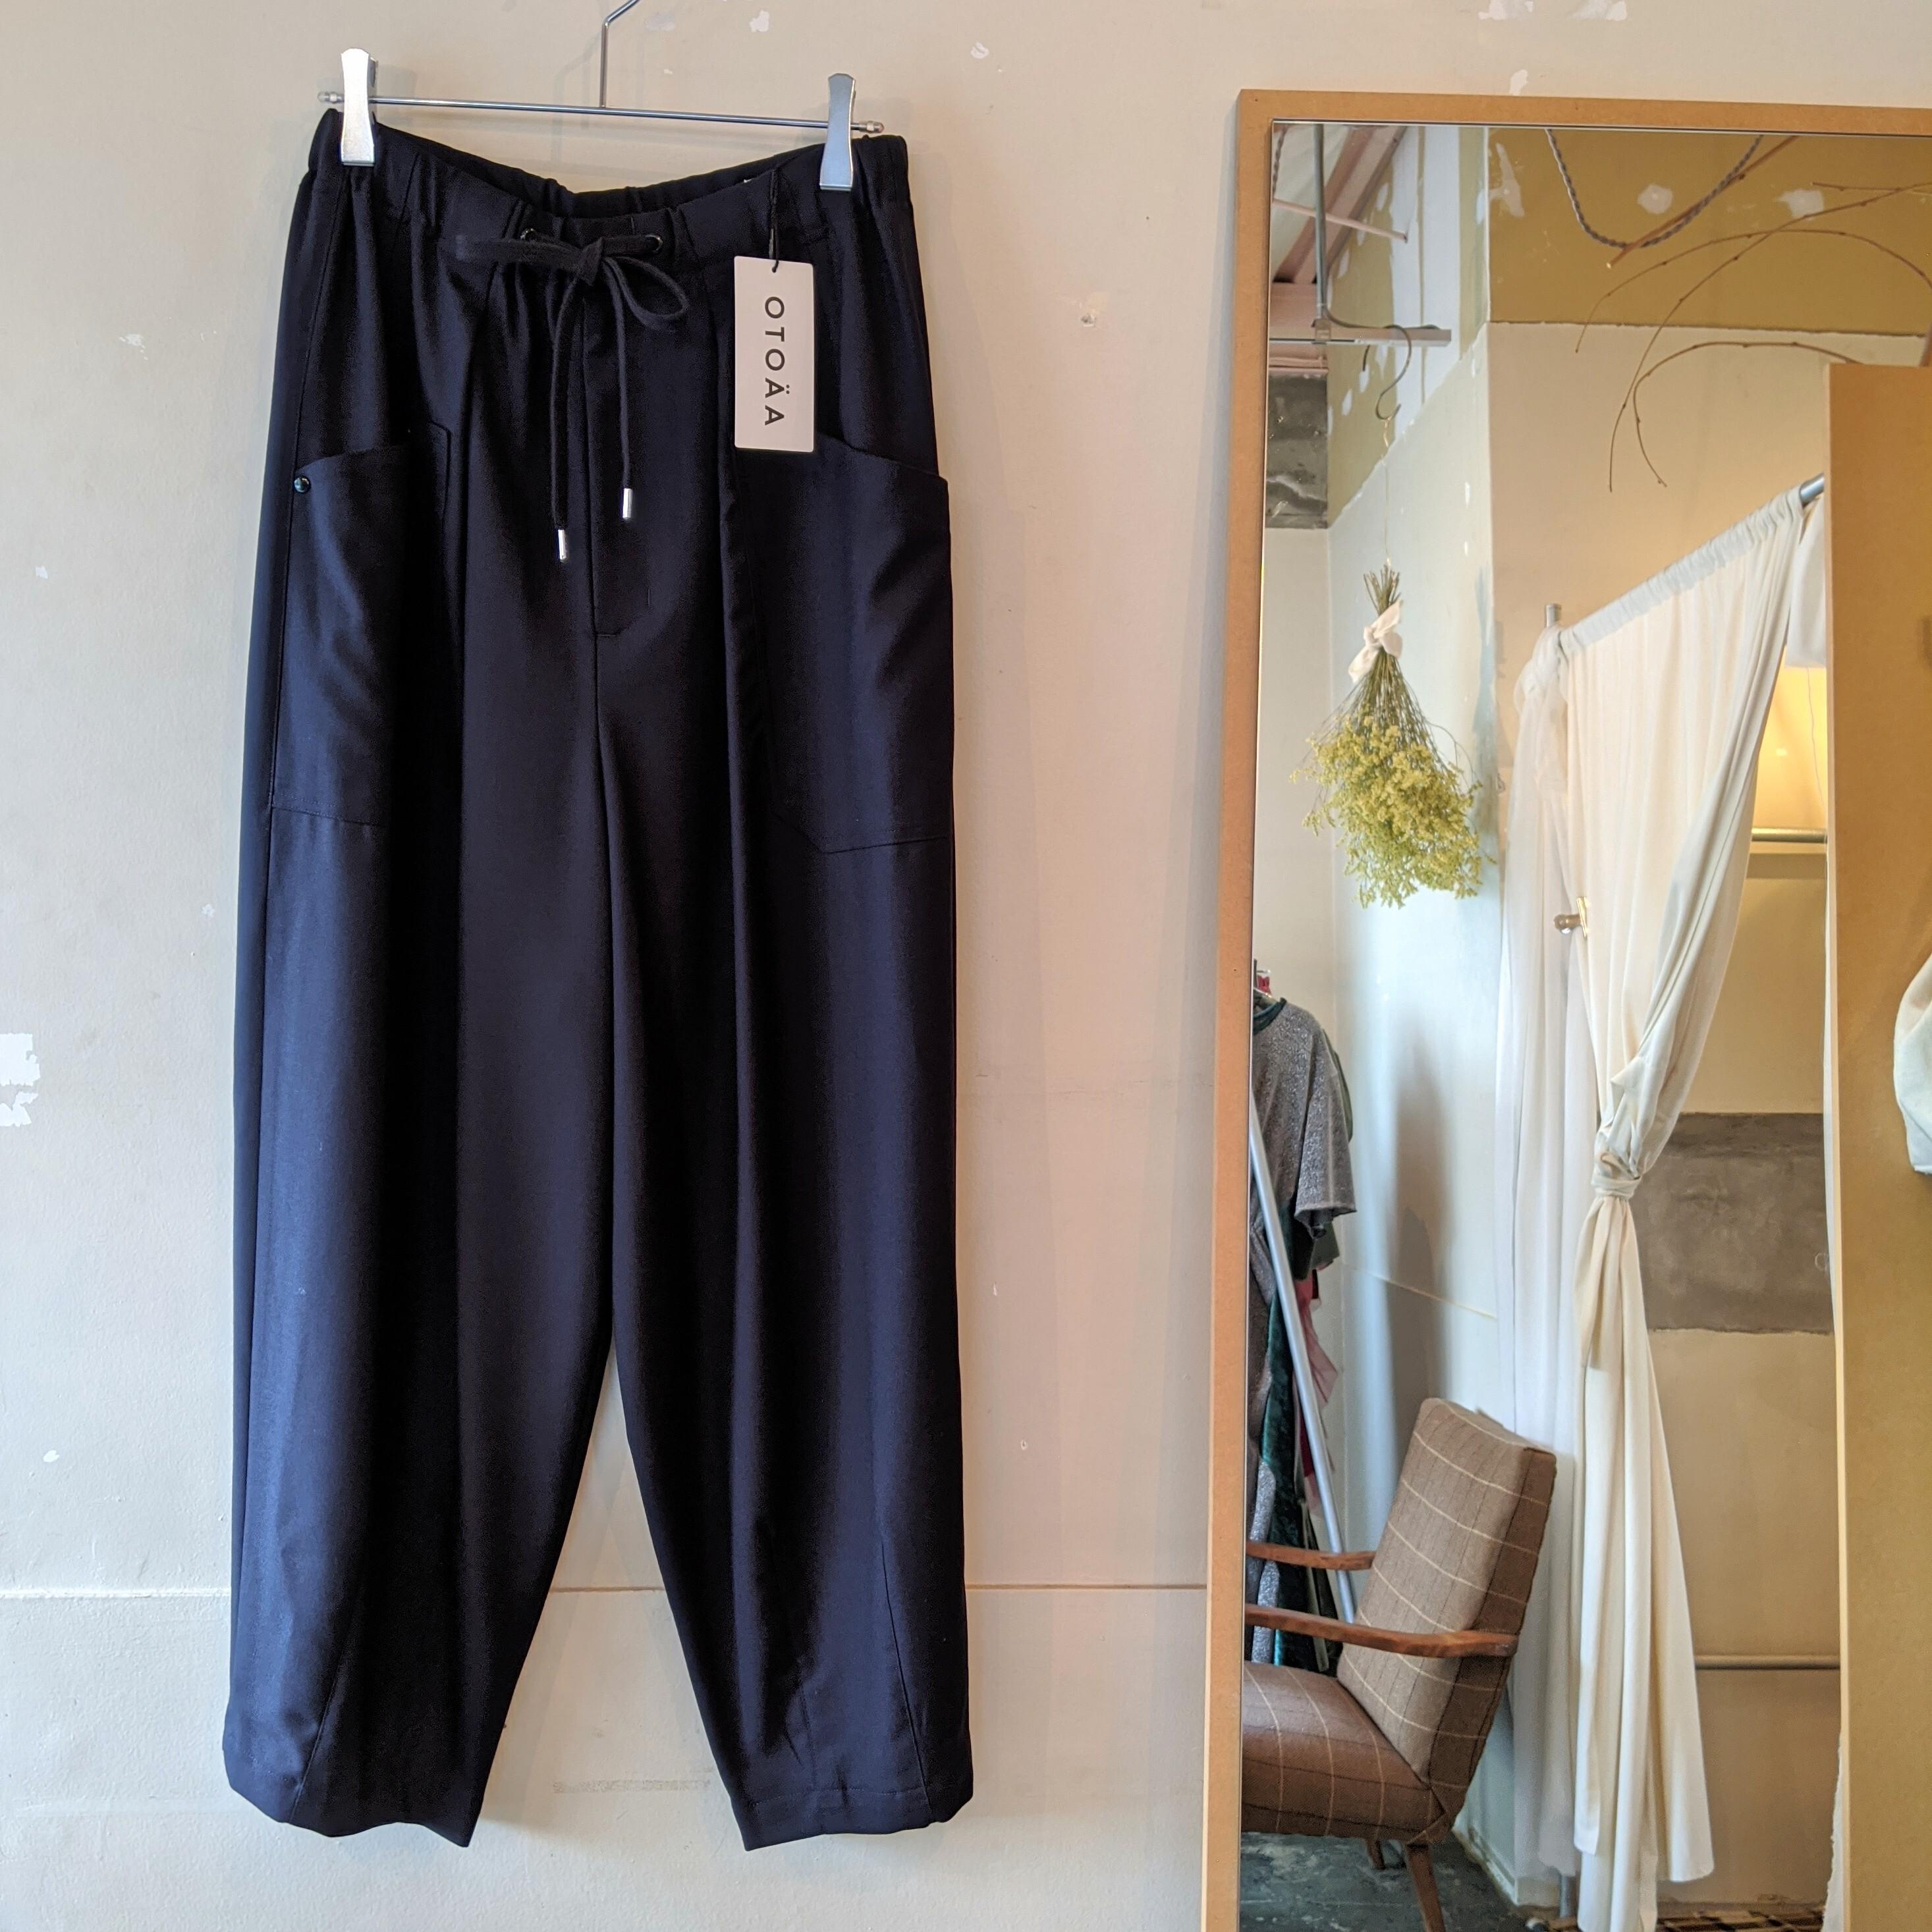 【 OTOÄA 】オトア SAXONY WIDE BALLOON PANTS/ ワイドバルーンパンツ SIZE2